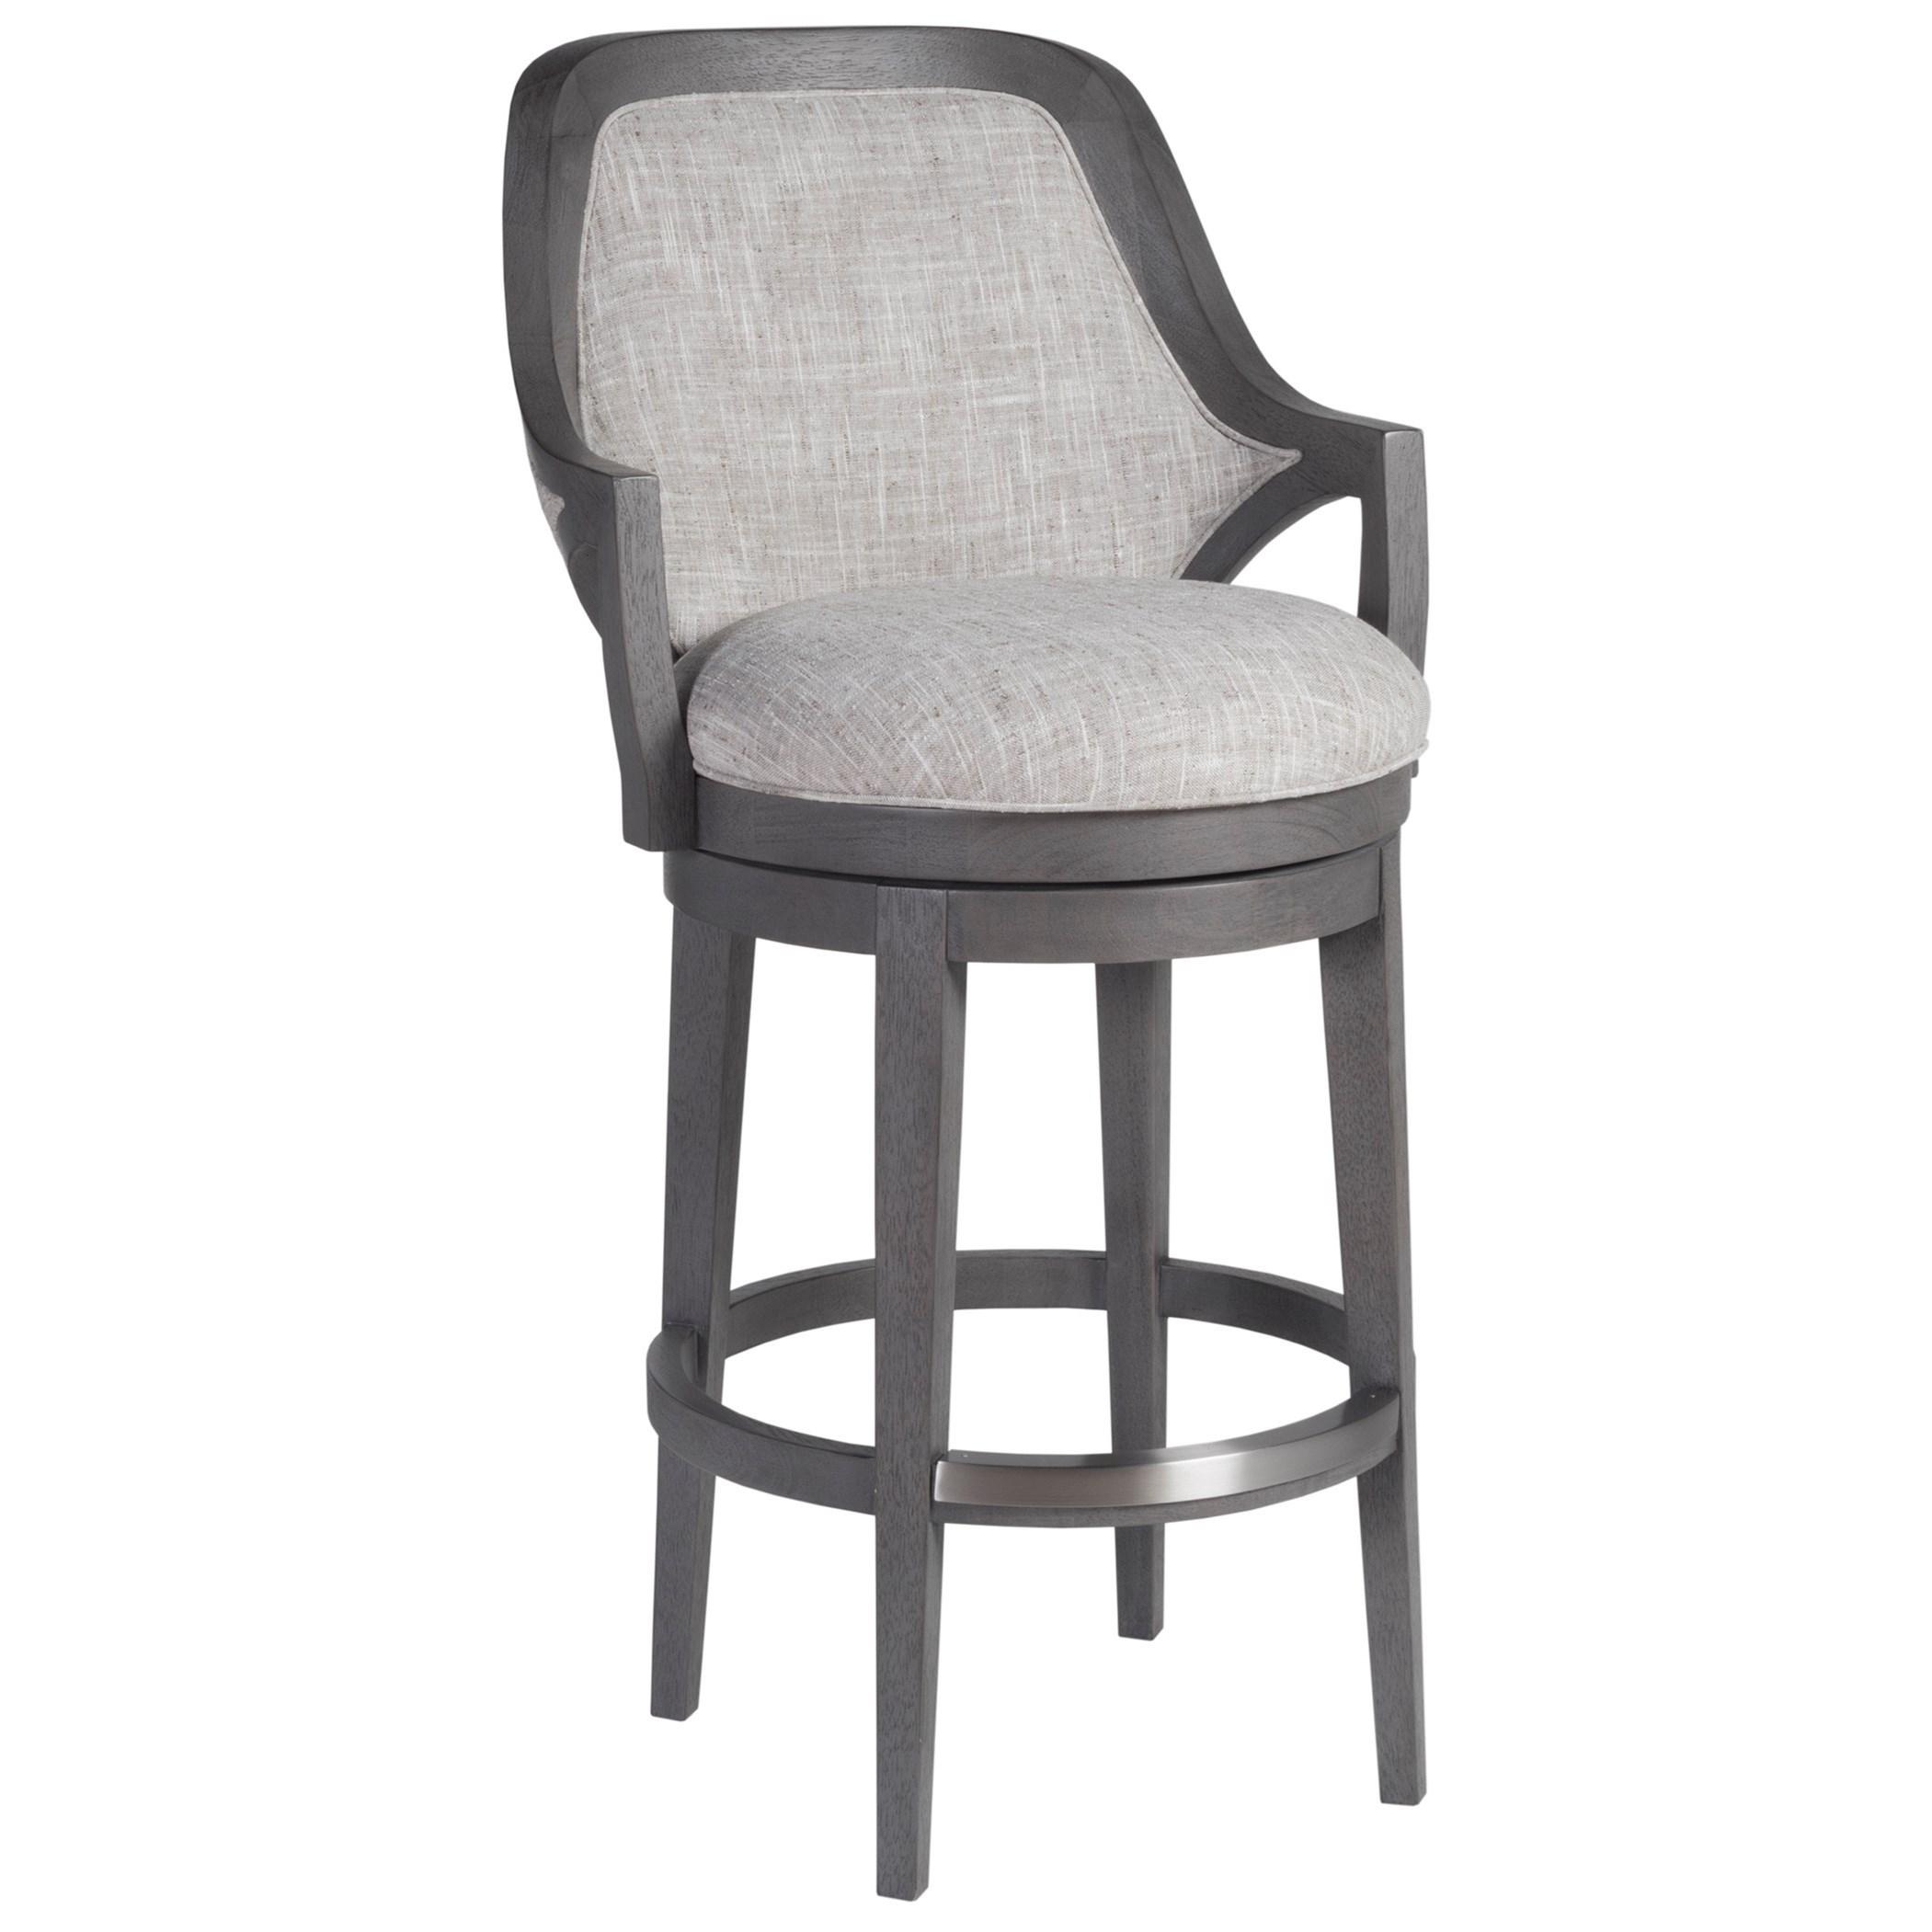 Appellation Upholstered Swivel Barstool by Artistica at Baer's Furniture